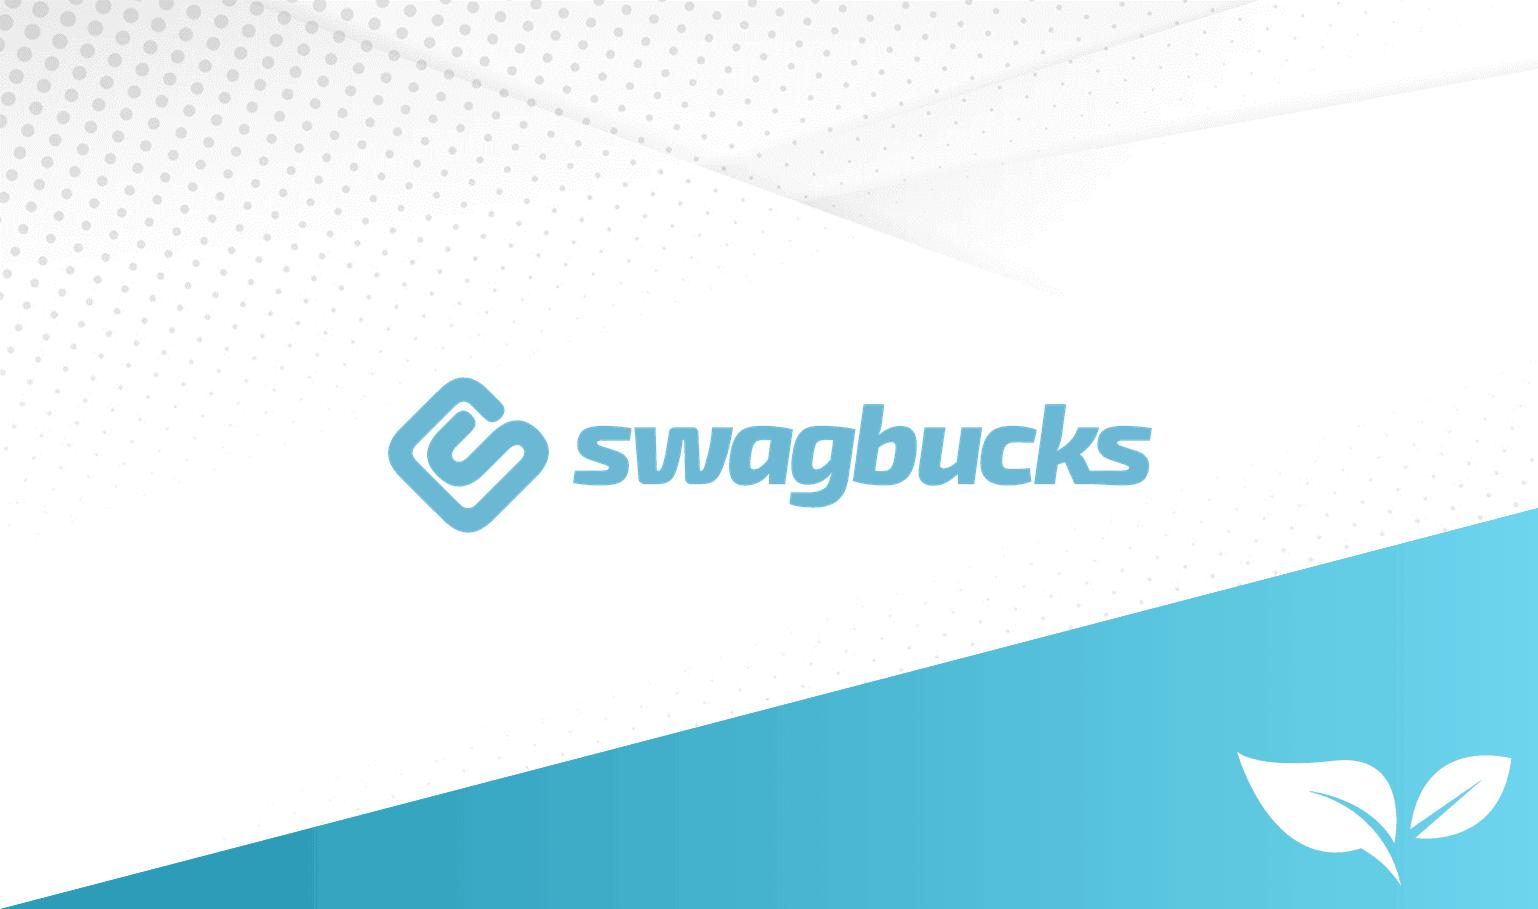 Swagbucks